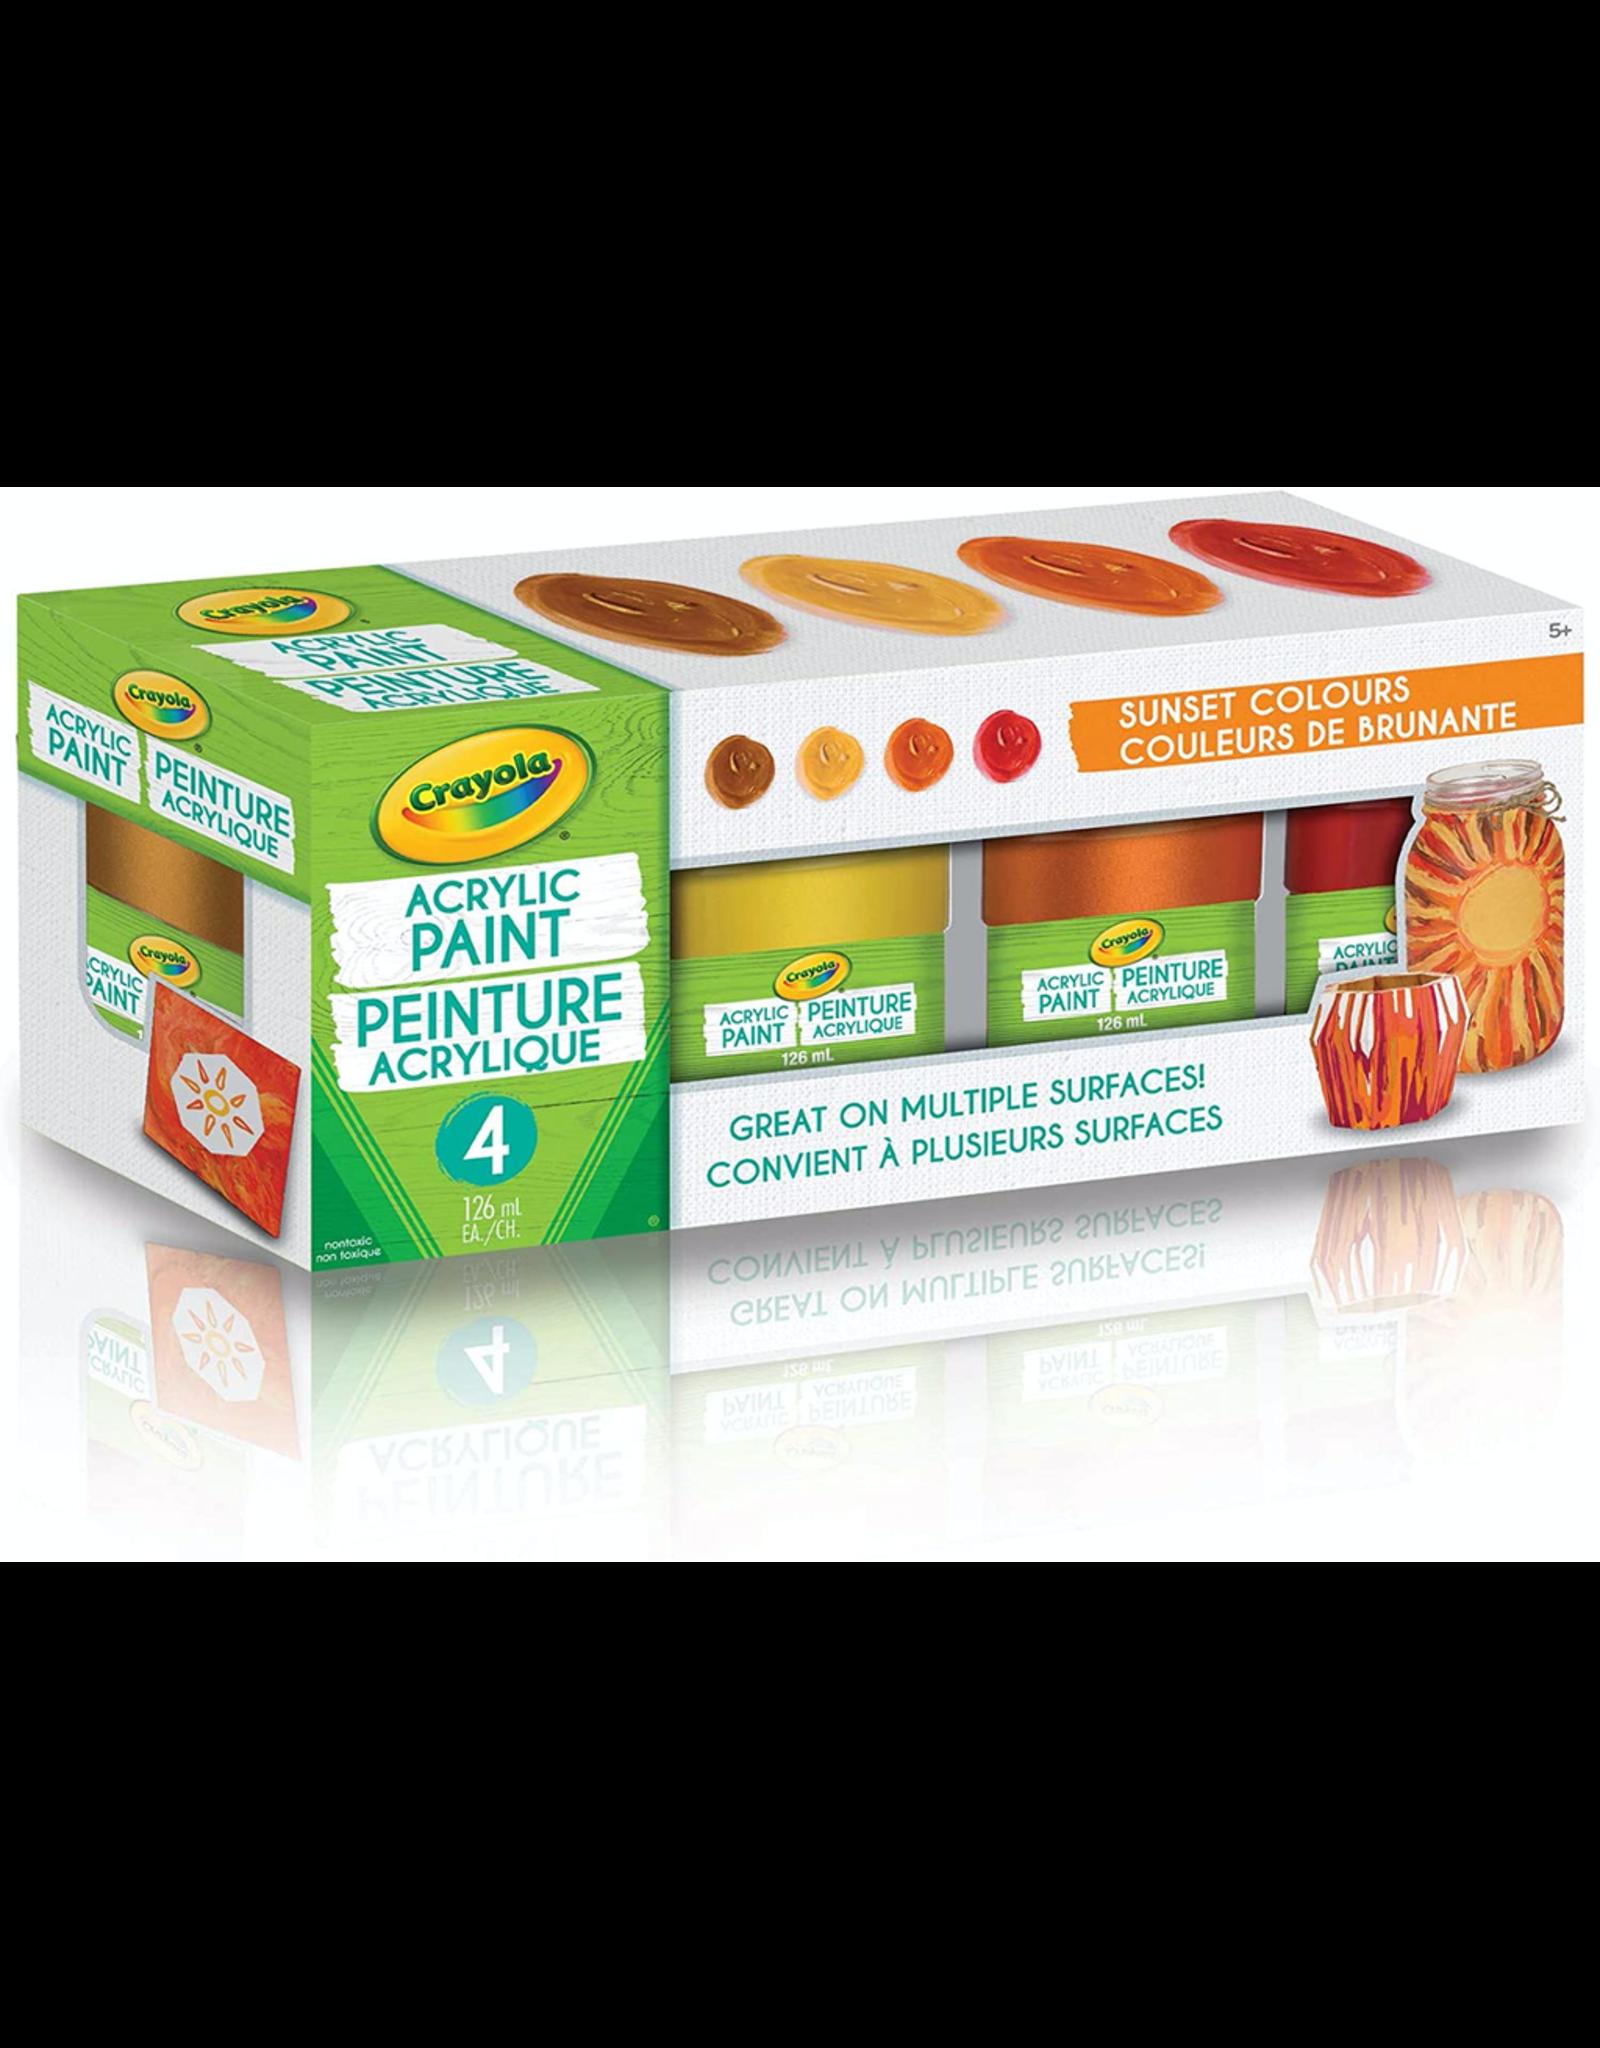 Crayola Sunset Colours Acrylic Paint Jars 4ct 126ml